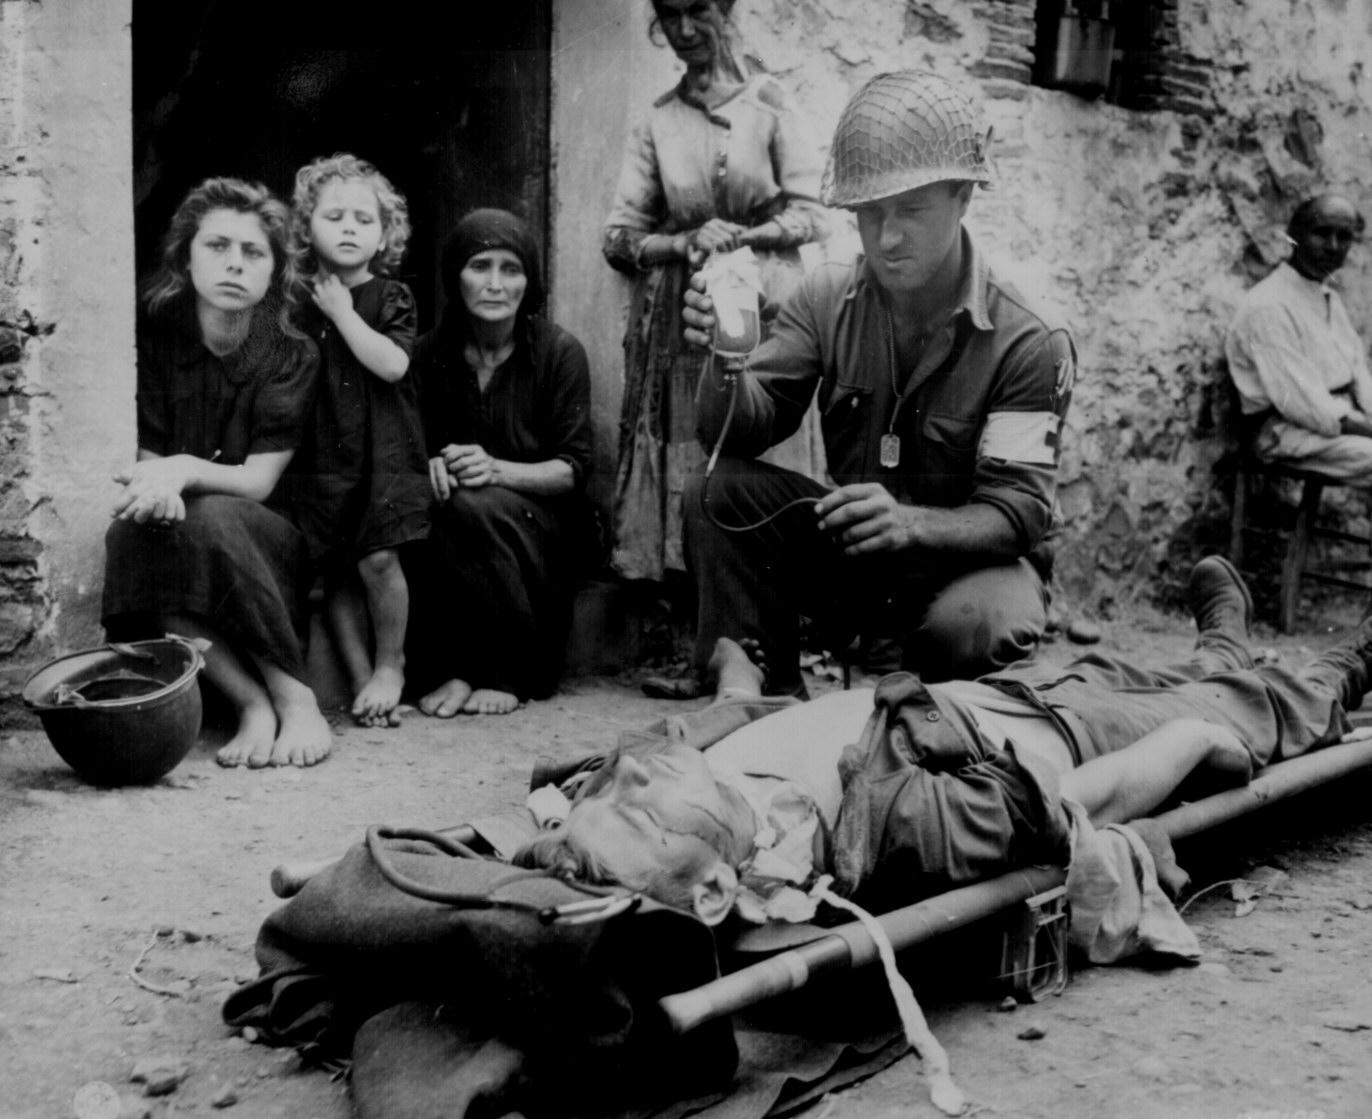 Triage on an Italian Street, 1943